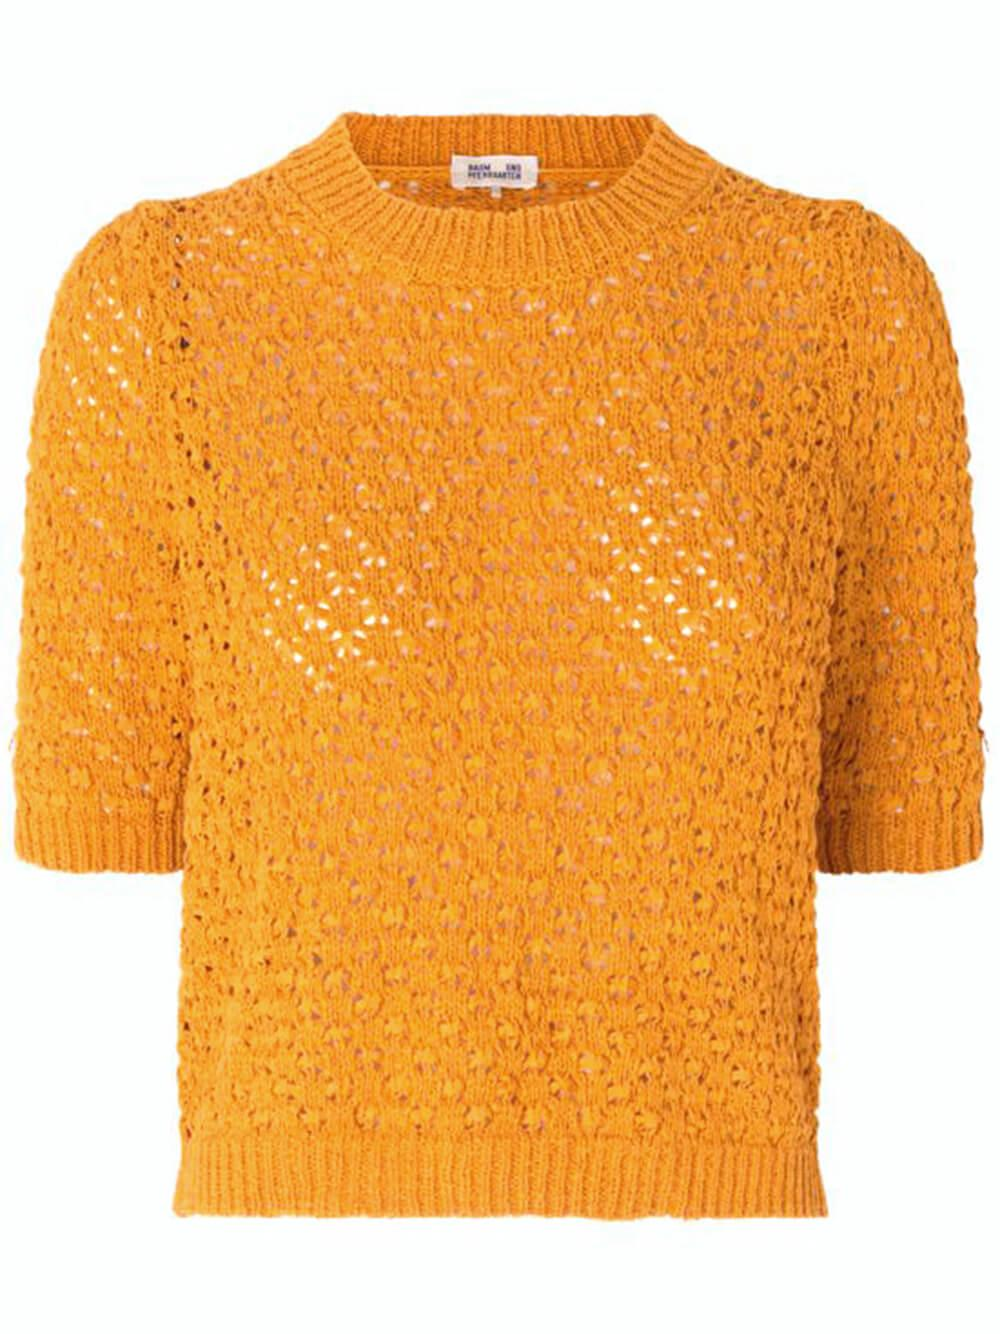 Cramer Sweater Item # 21750